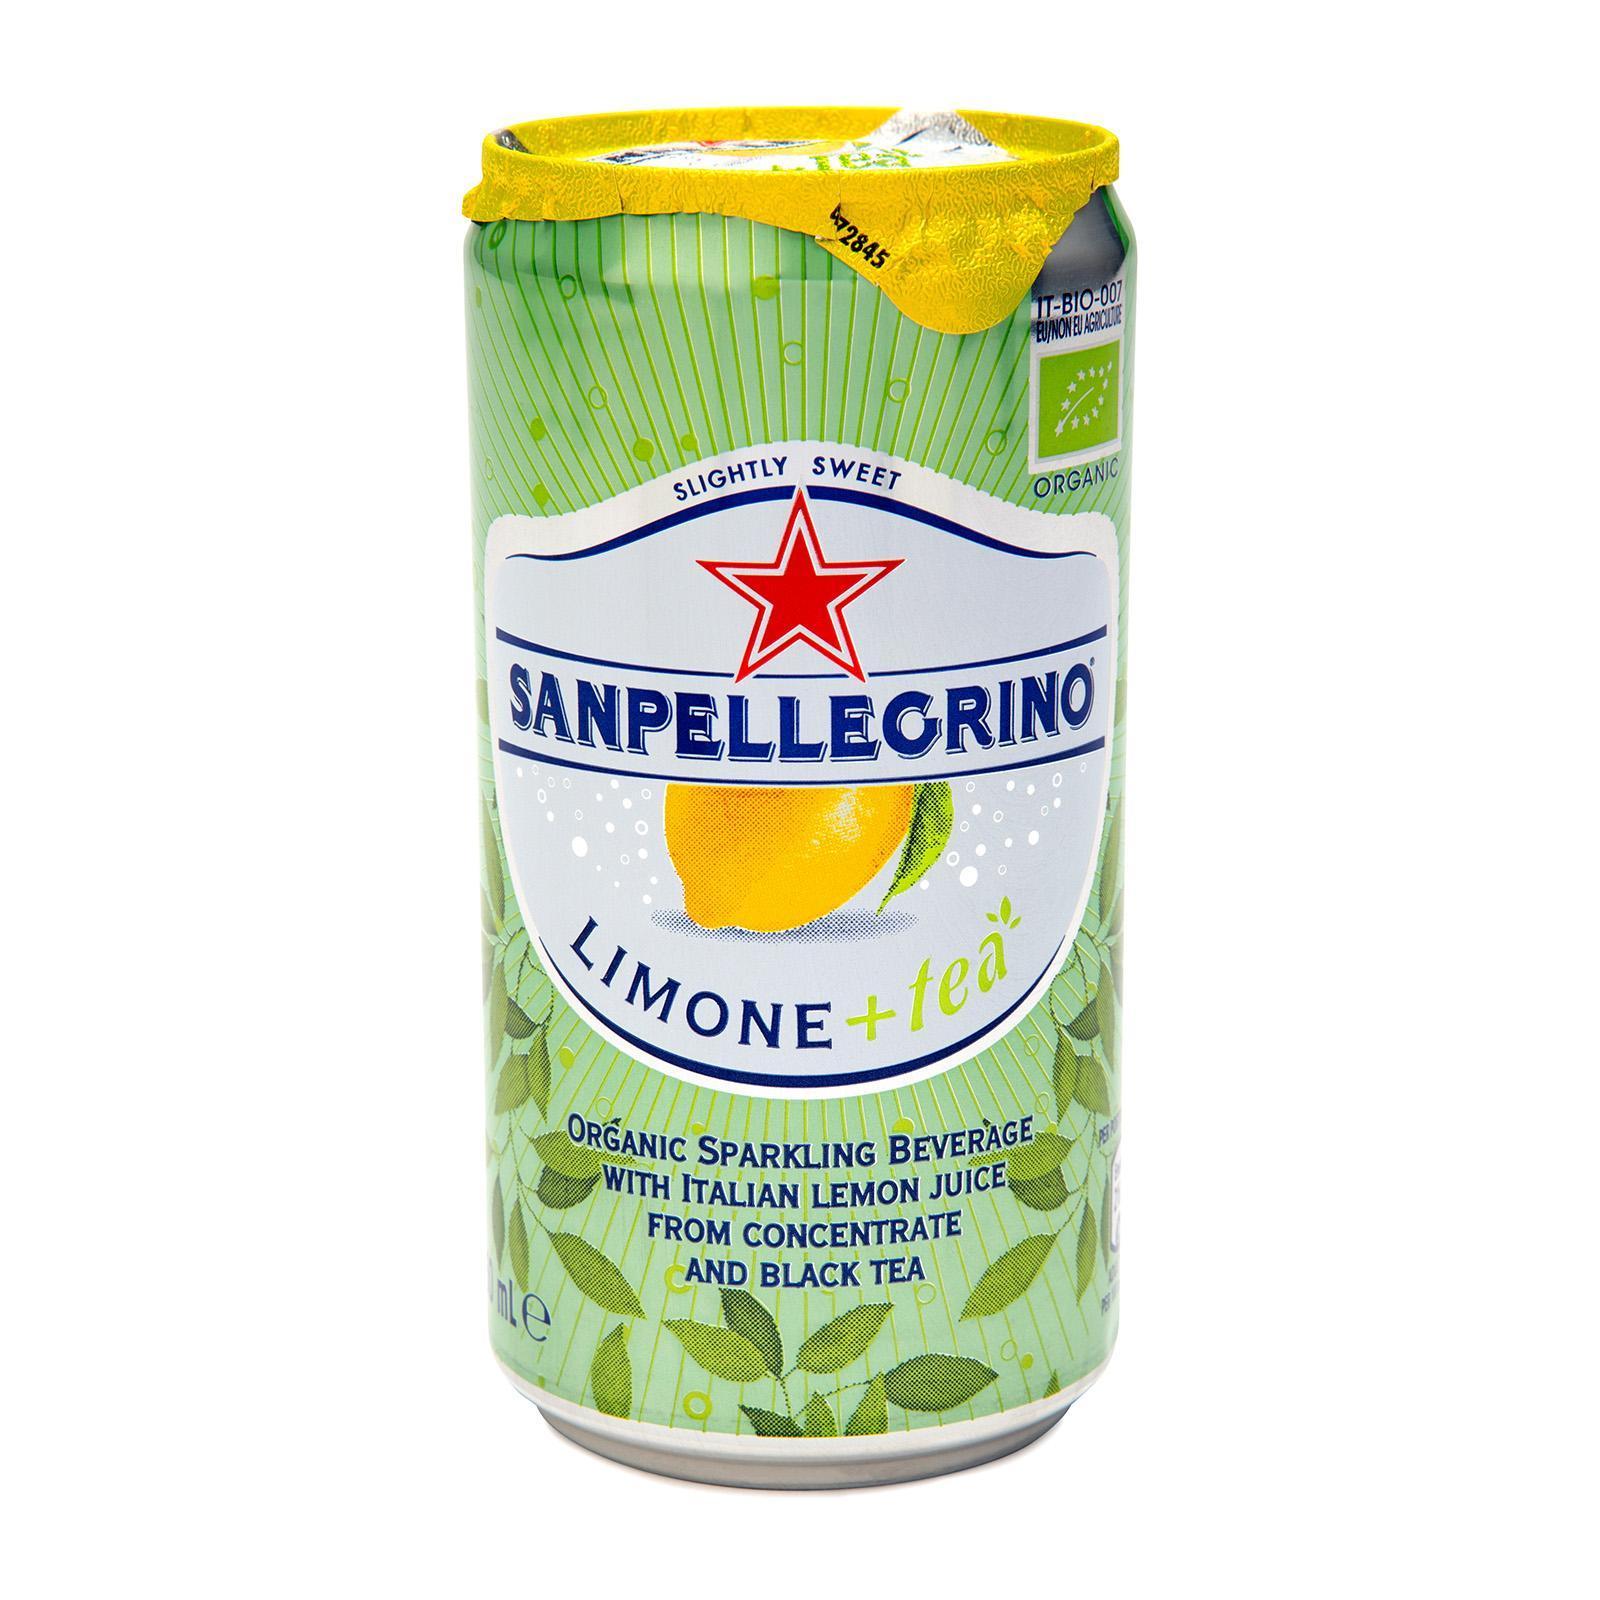 San Pellegrino Limone+Tea Organic Sparkling Lemon Tea